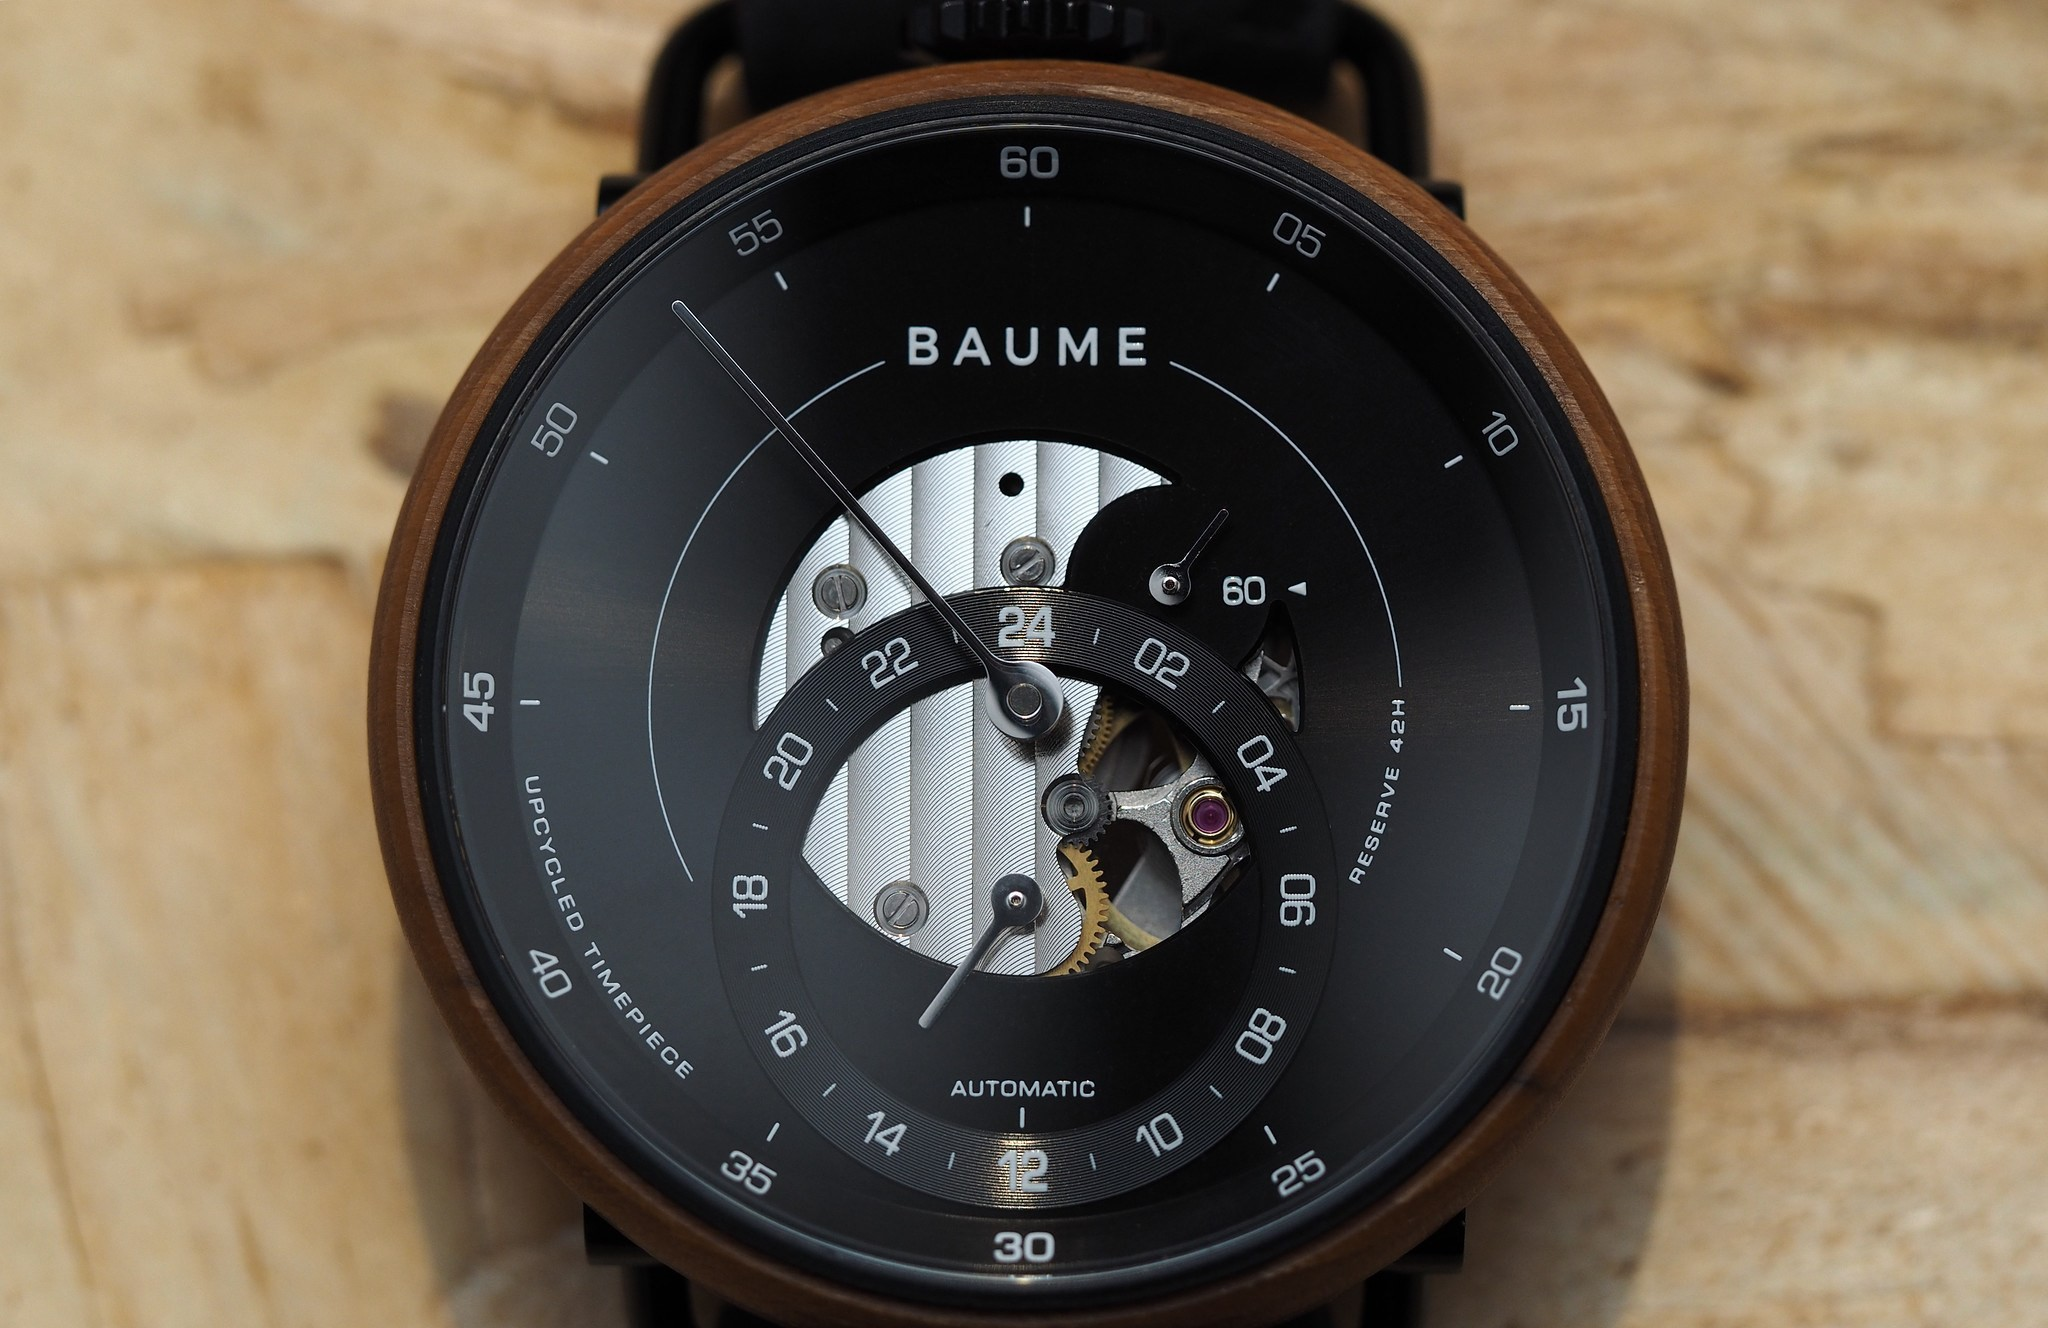 https://static.watchtime.com/wp-content/uploads/2018/05/42mm-automatique-300x600.png